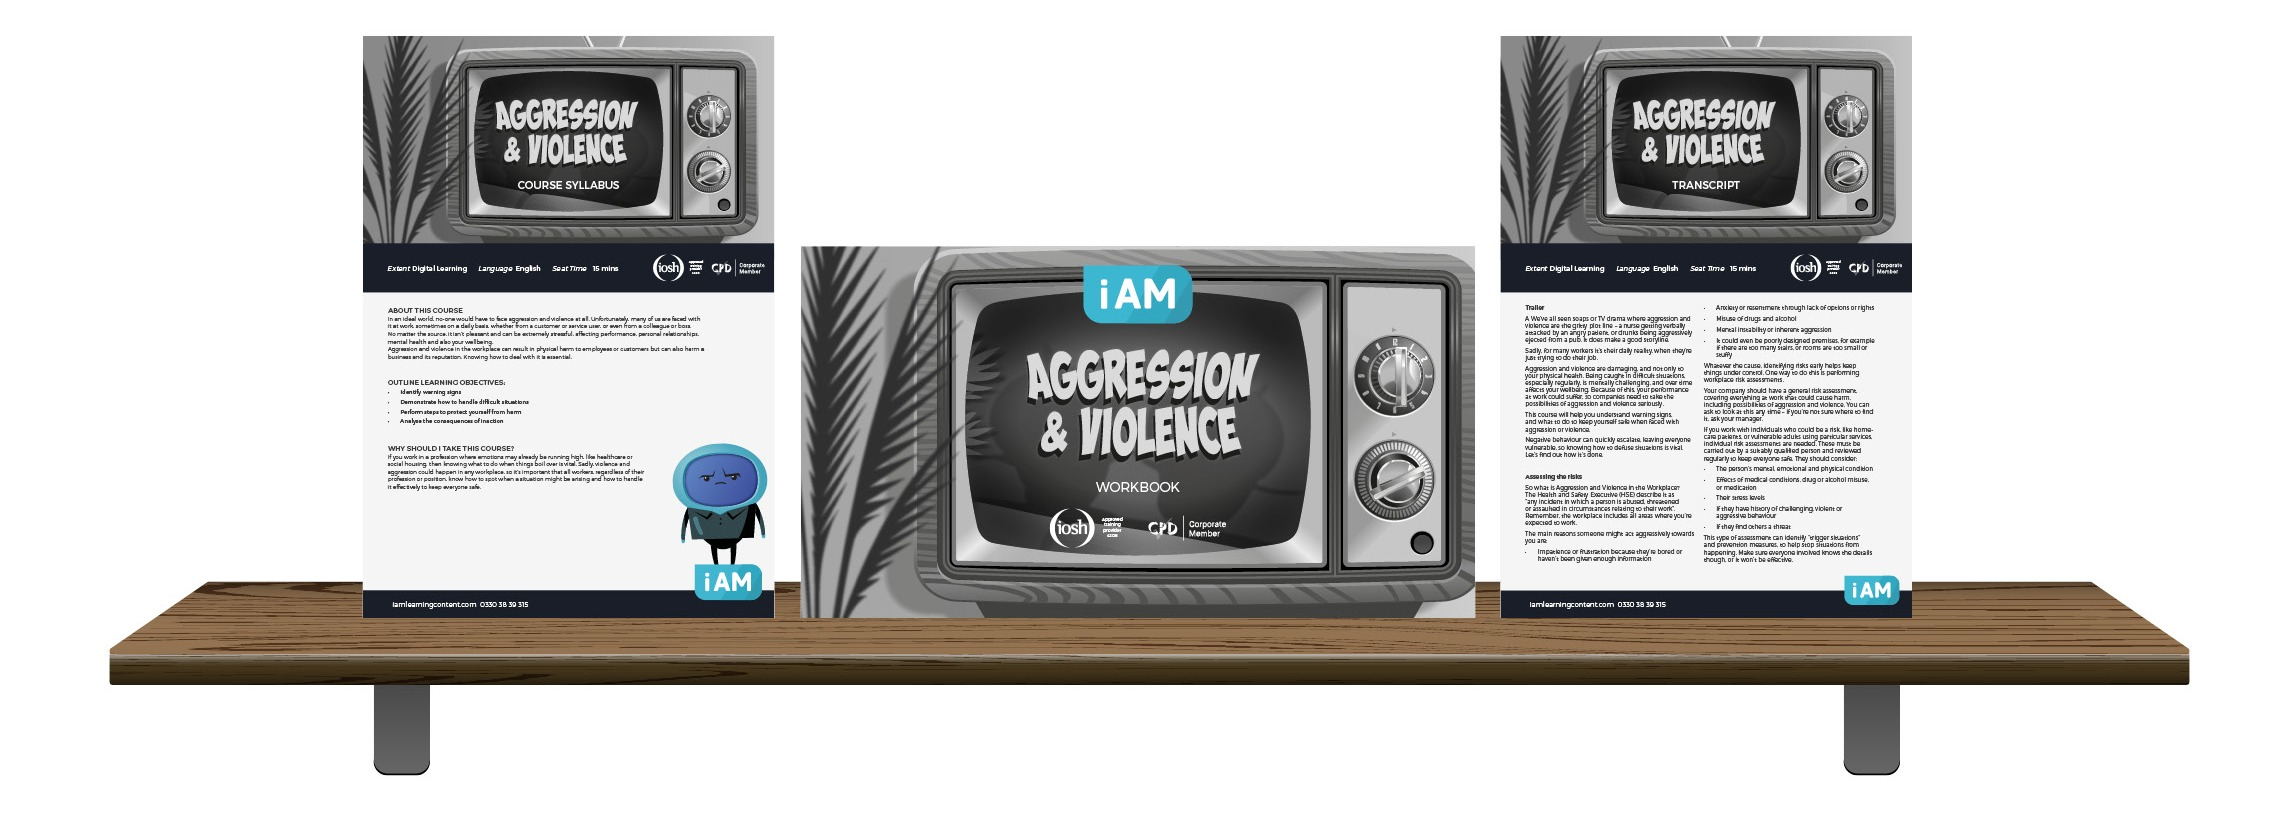 iAM 00025 - Aggression & Violence - Landing Page8